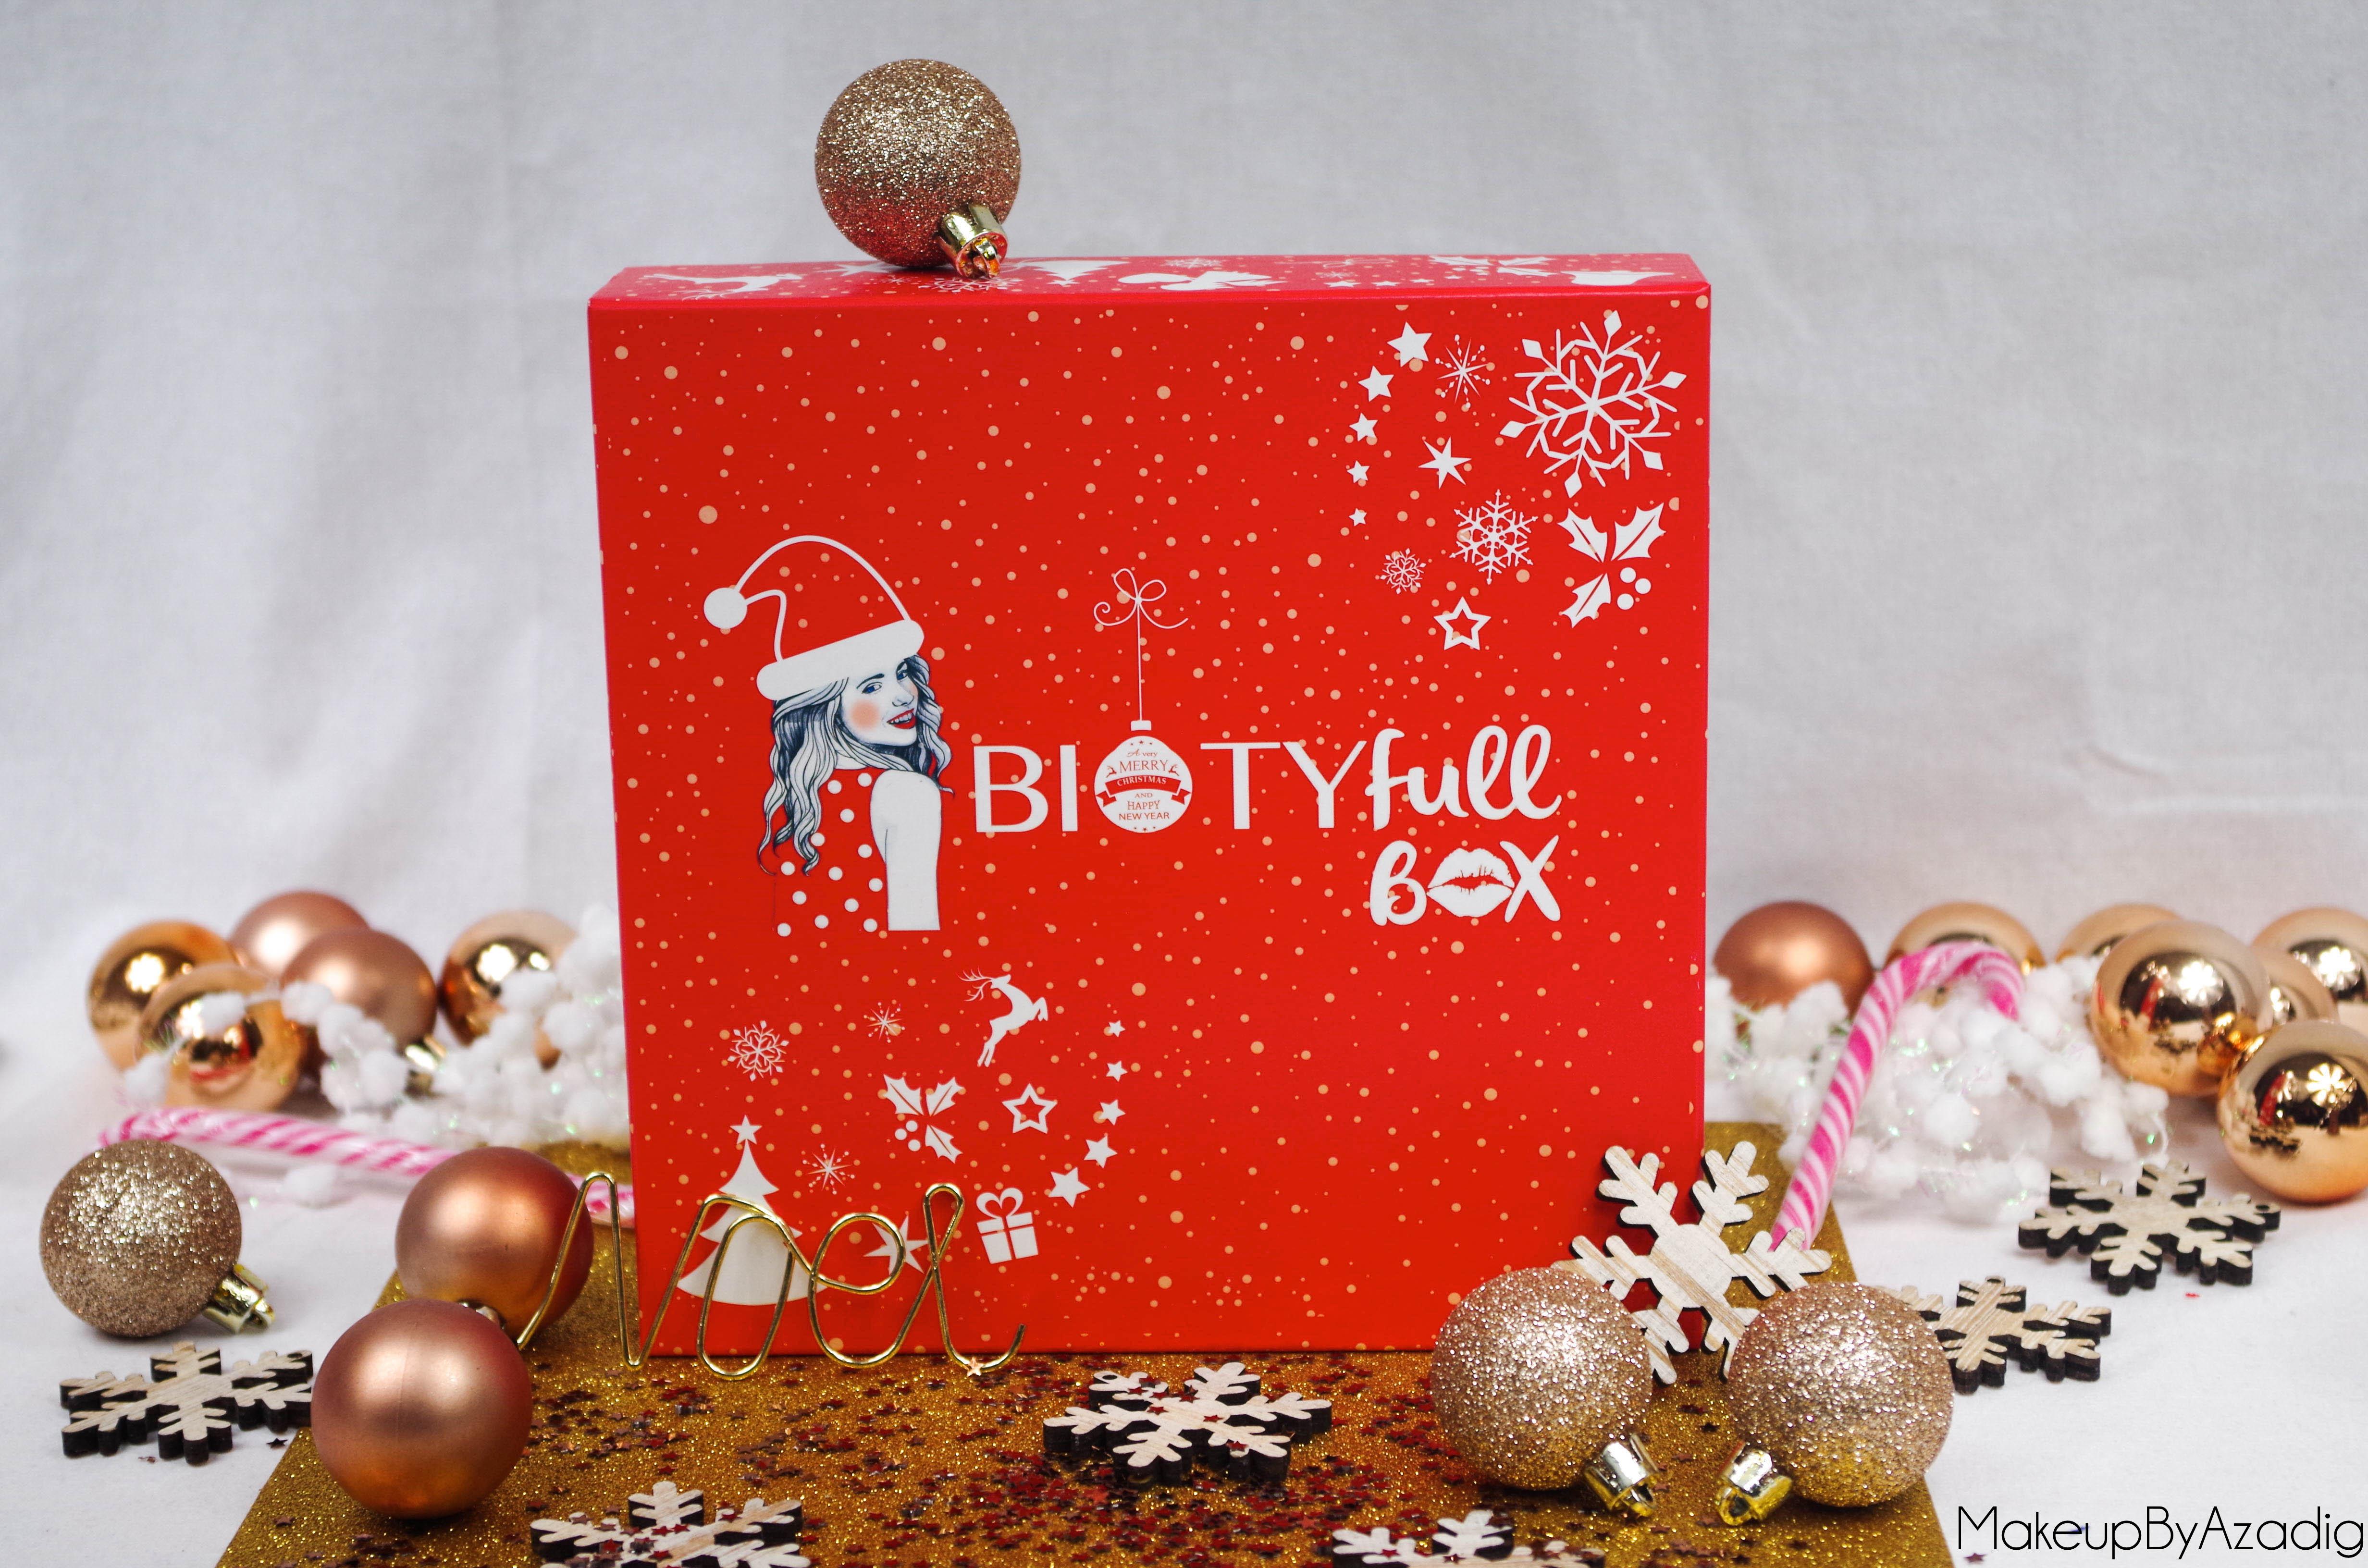 biotyfull-box-beaute-makeupbyazadig-revue-avis-prix-troyes-paris-produits-bio-noel